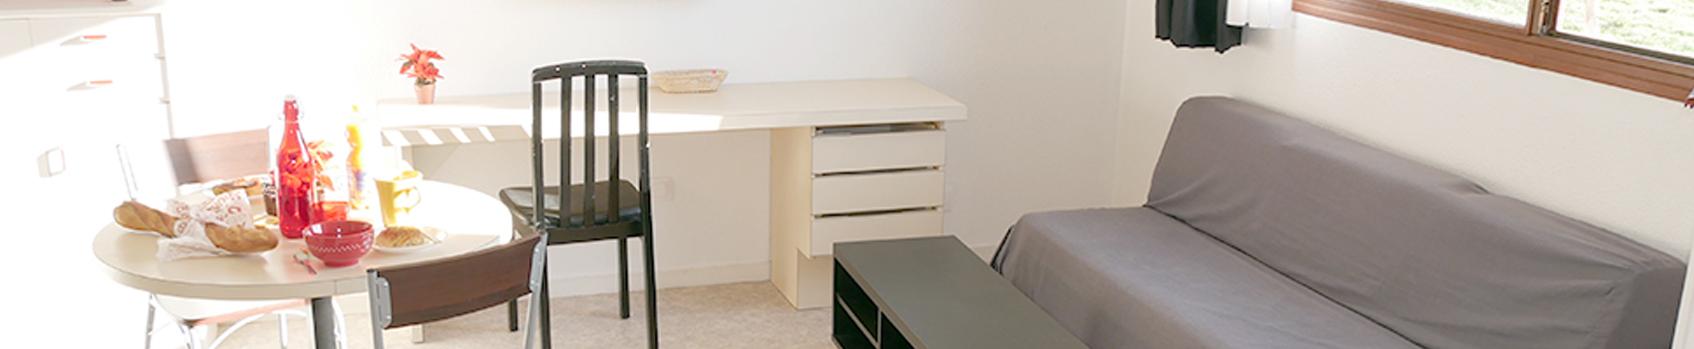 -location-caen-hebergement-meuble-